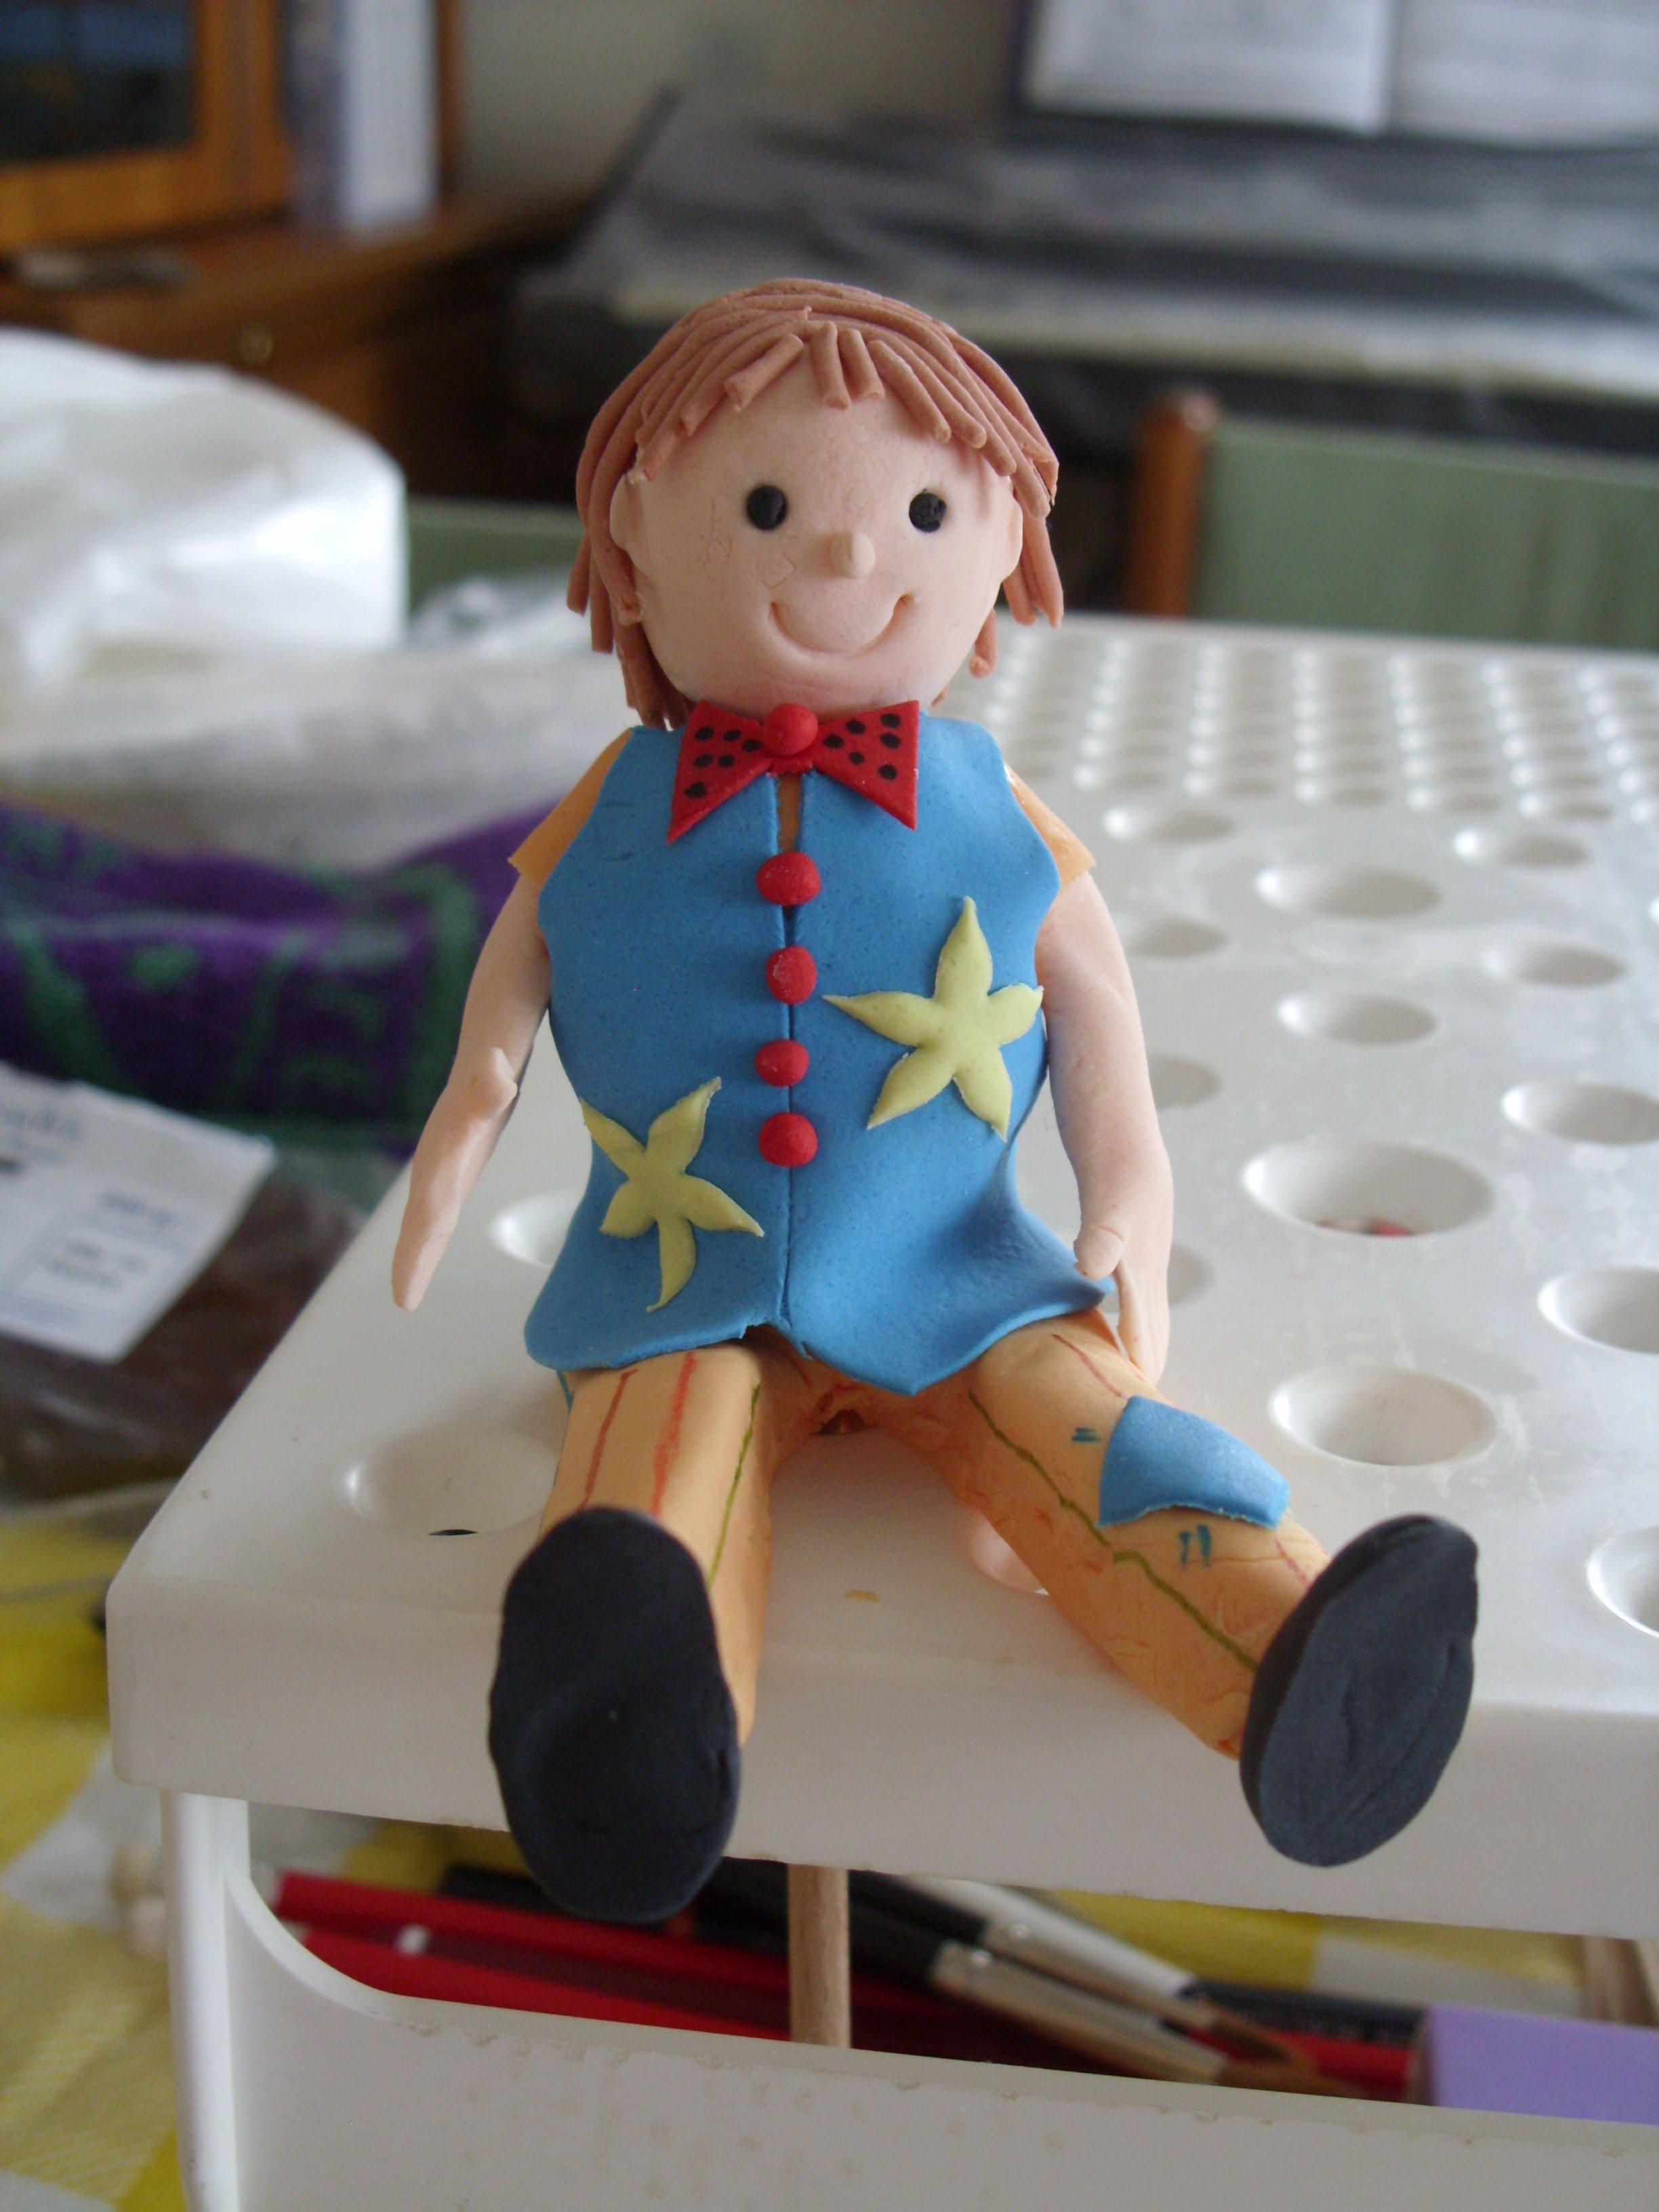 tias-2nd-birthday-mr-tumble-1st-model-figurine-made-2